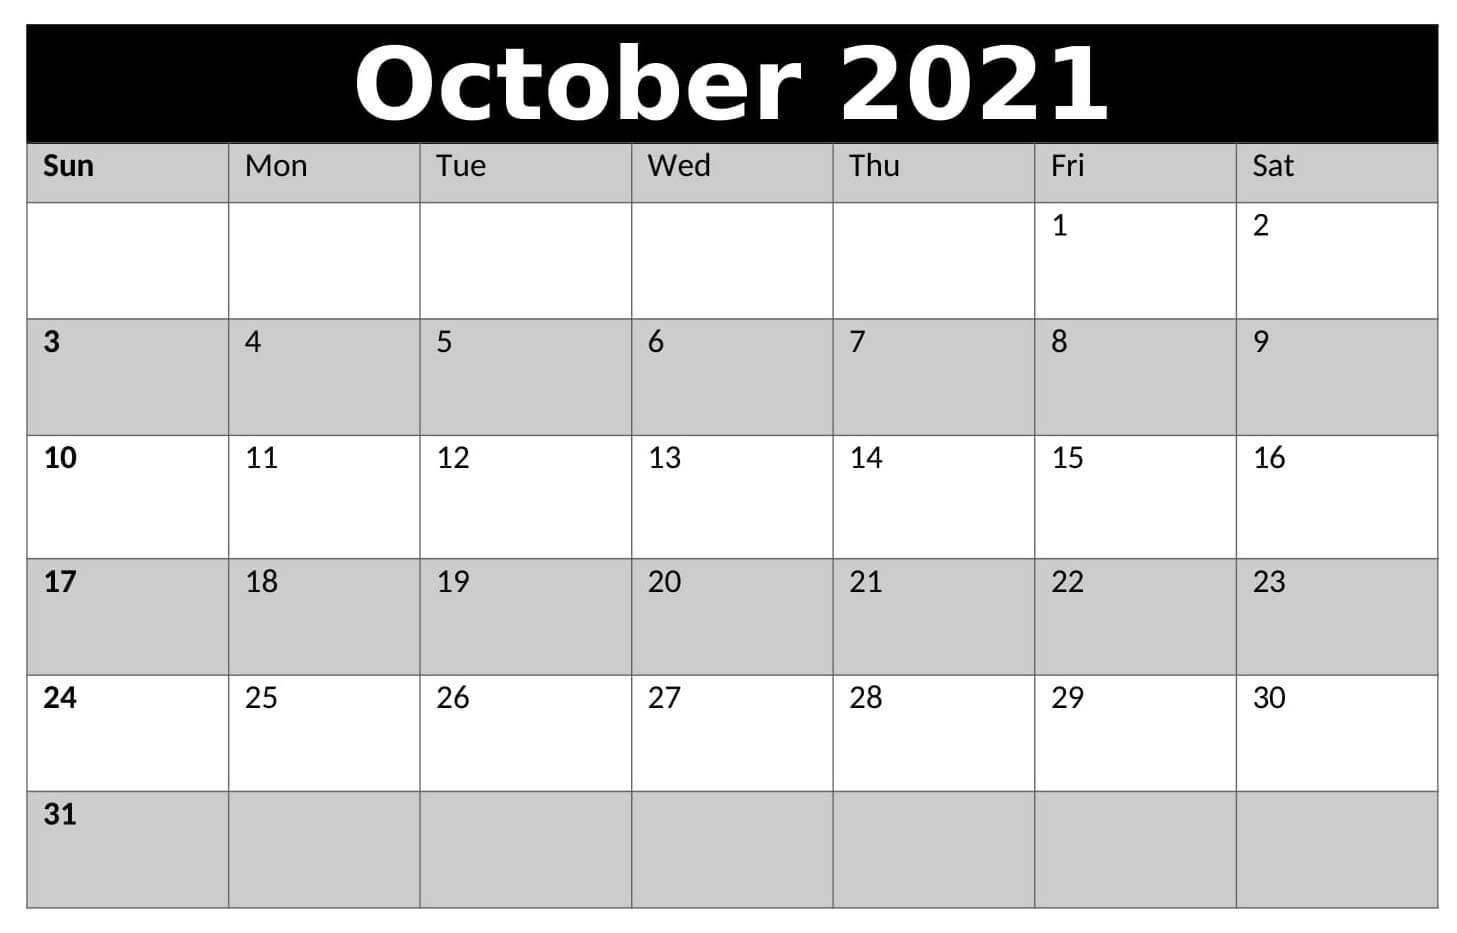 Monthly Blank Calendar For October 2021